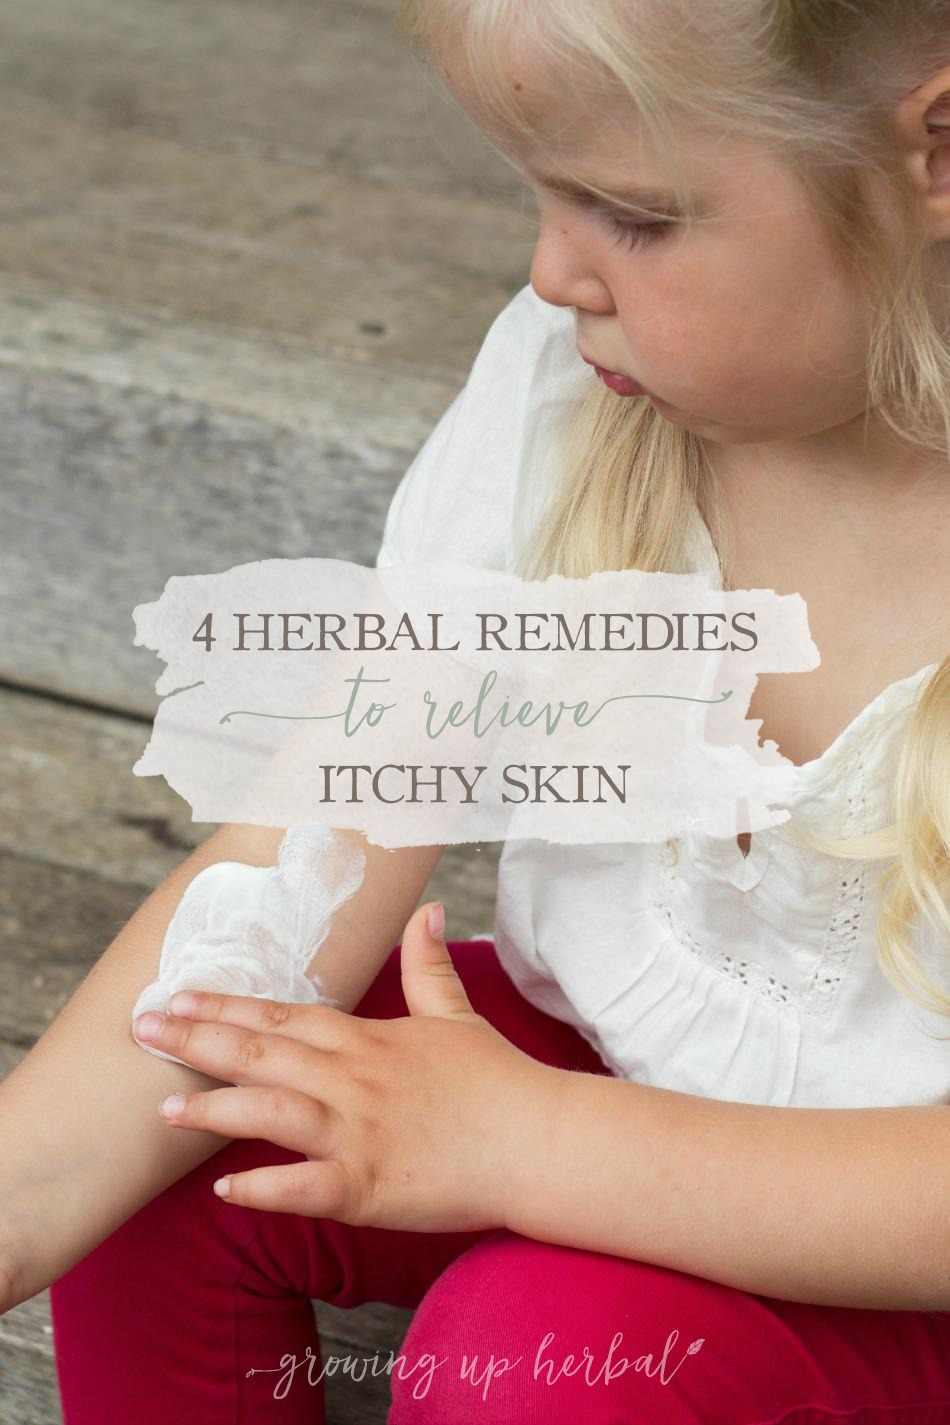 4 Herbal Remedies To Relieve Itchy Skin - GrowingUpHerbal